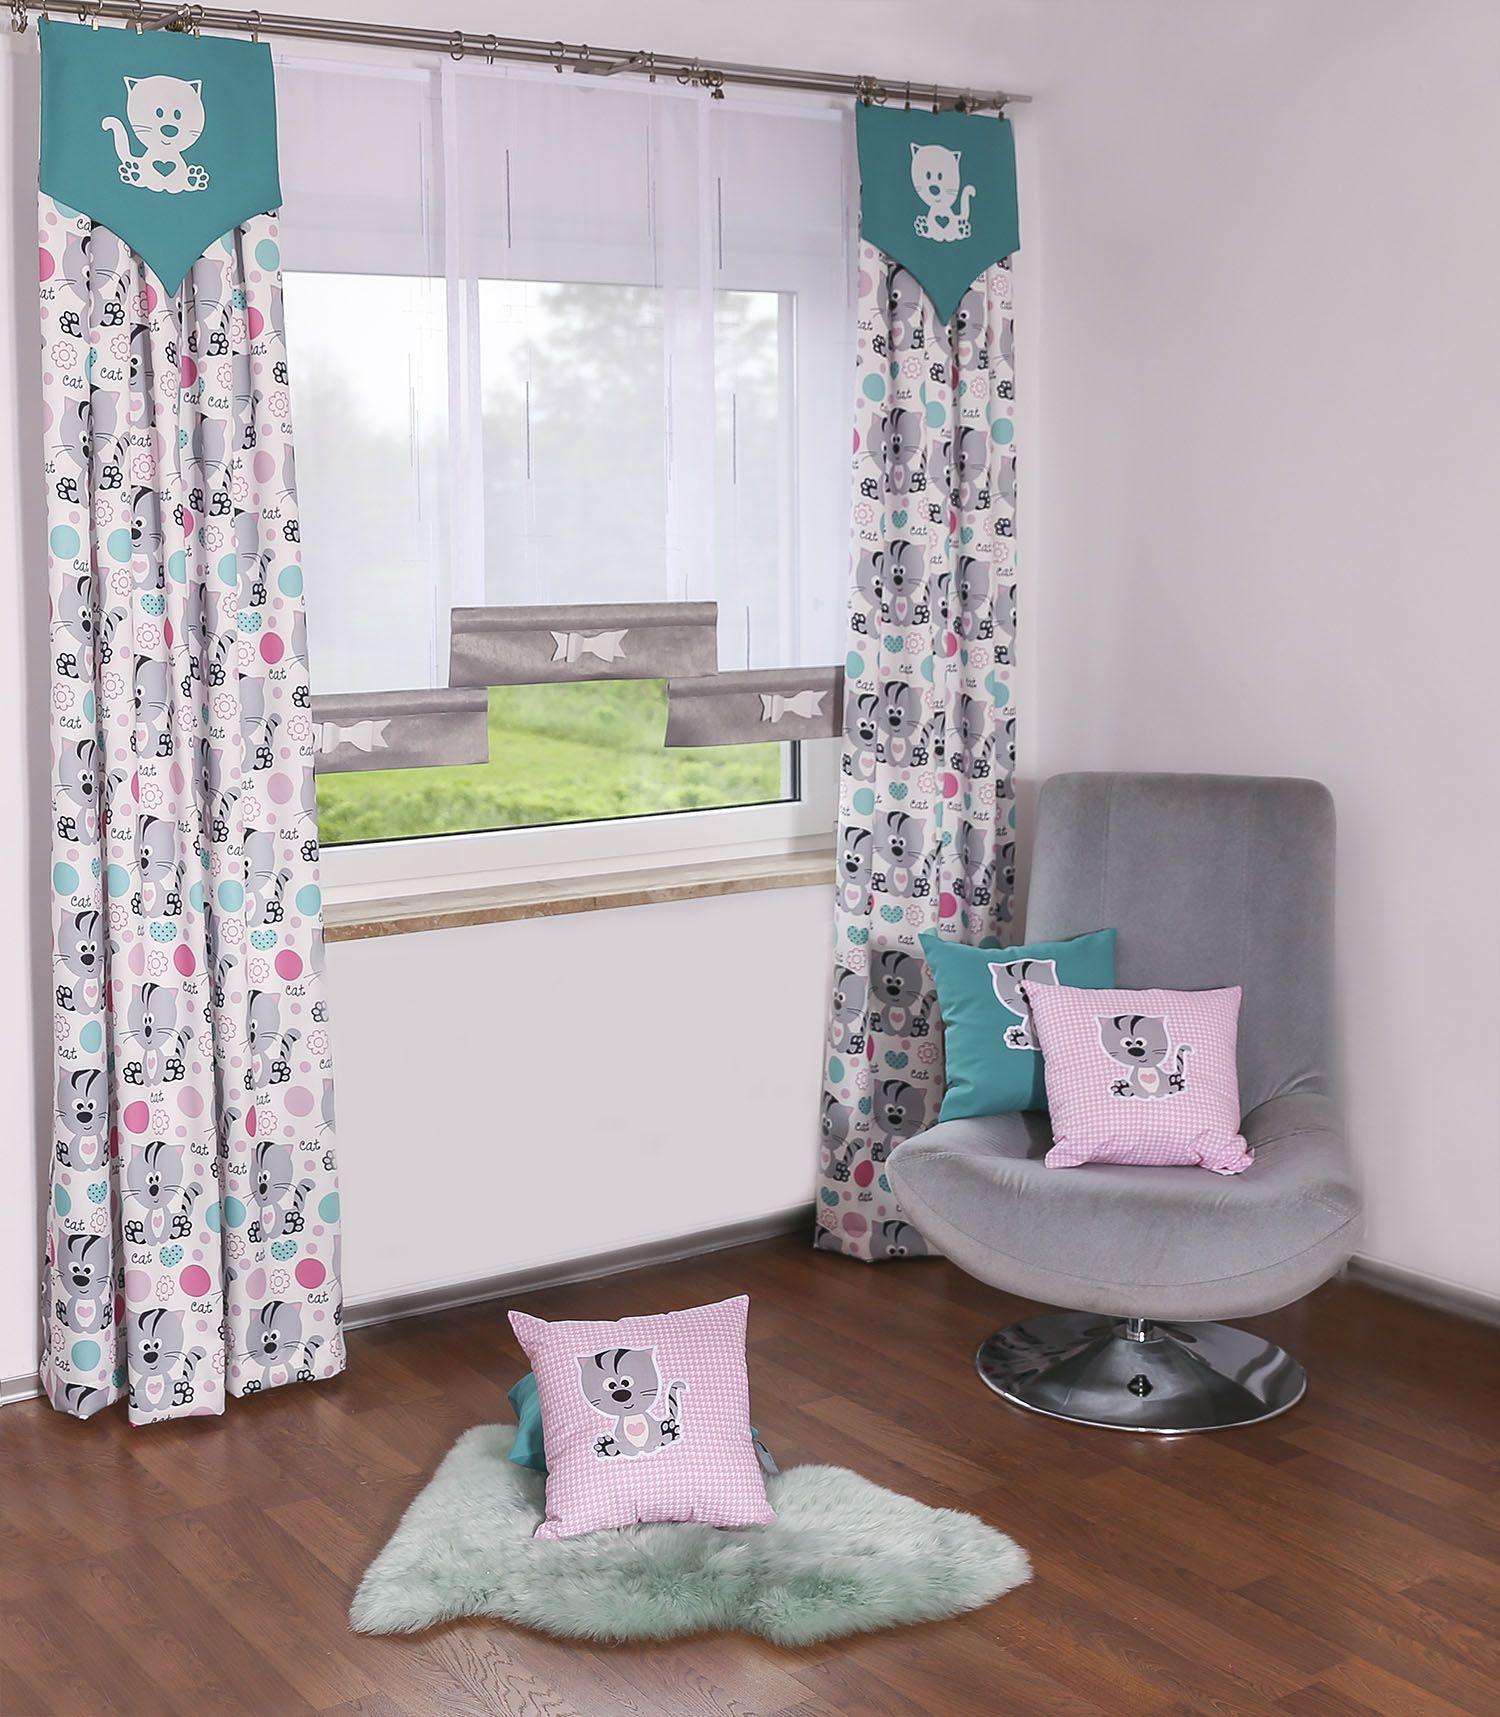 Firany W Pokoju Dziecka Home Decor Decor Curtains